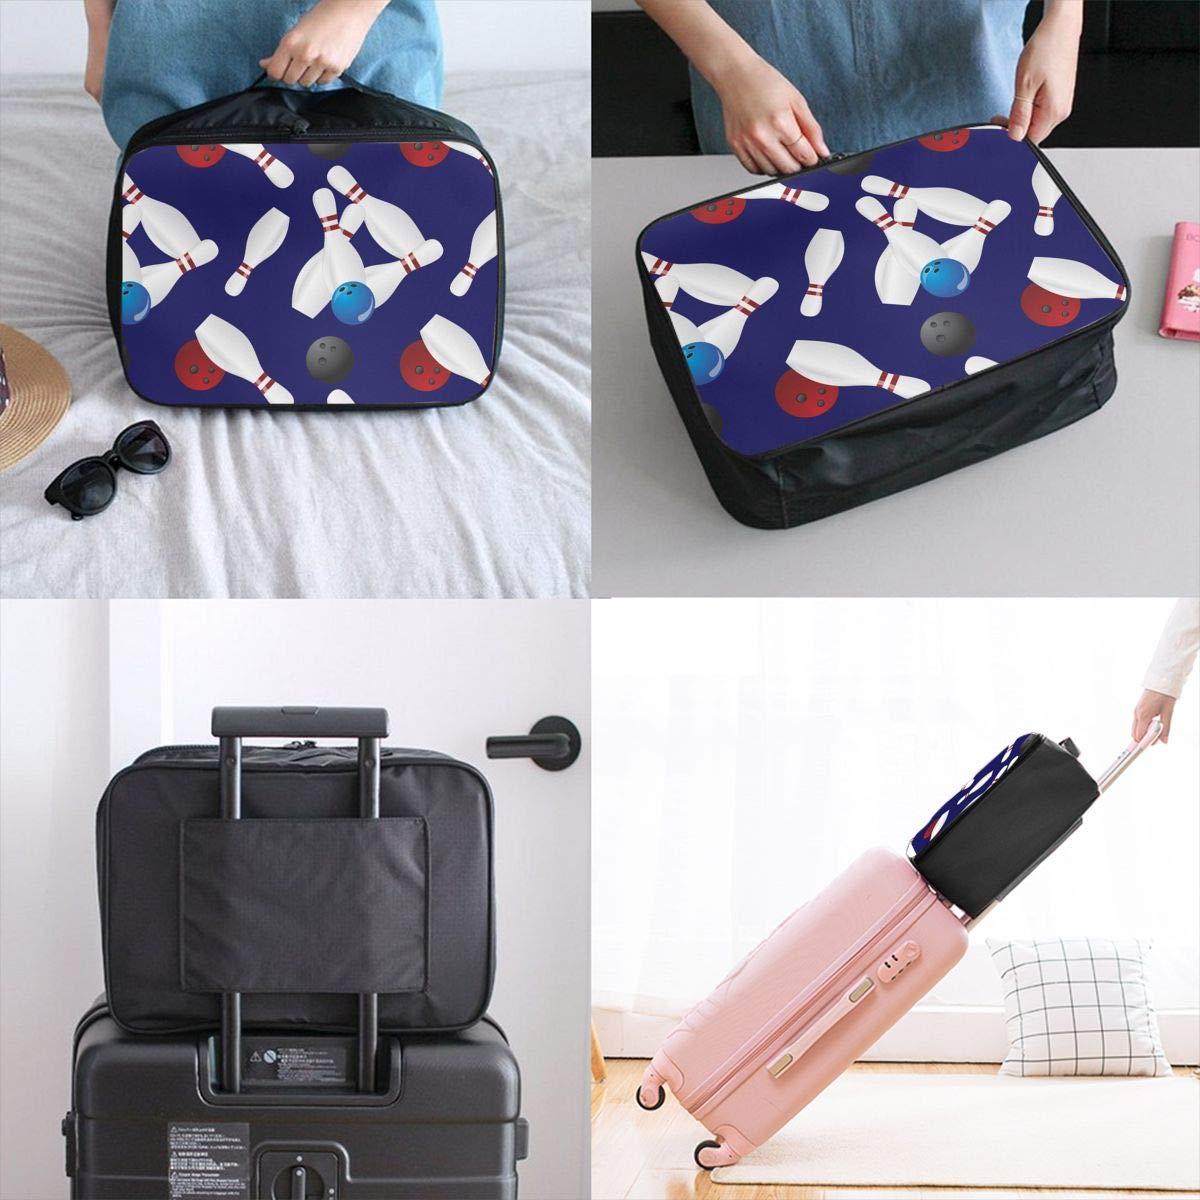 YINLAN Foldable Multifunctional Waterproof Duffel Travel Storage Bag Bowling Ball Lightweight Large Capacity Portable Luggage Bag